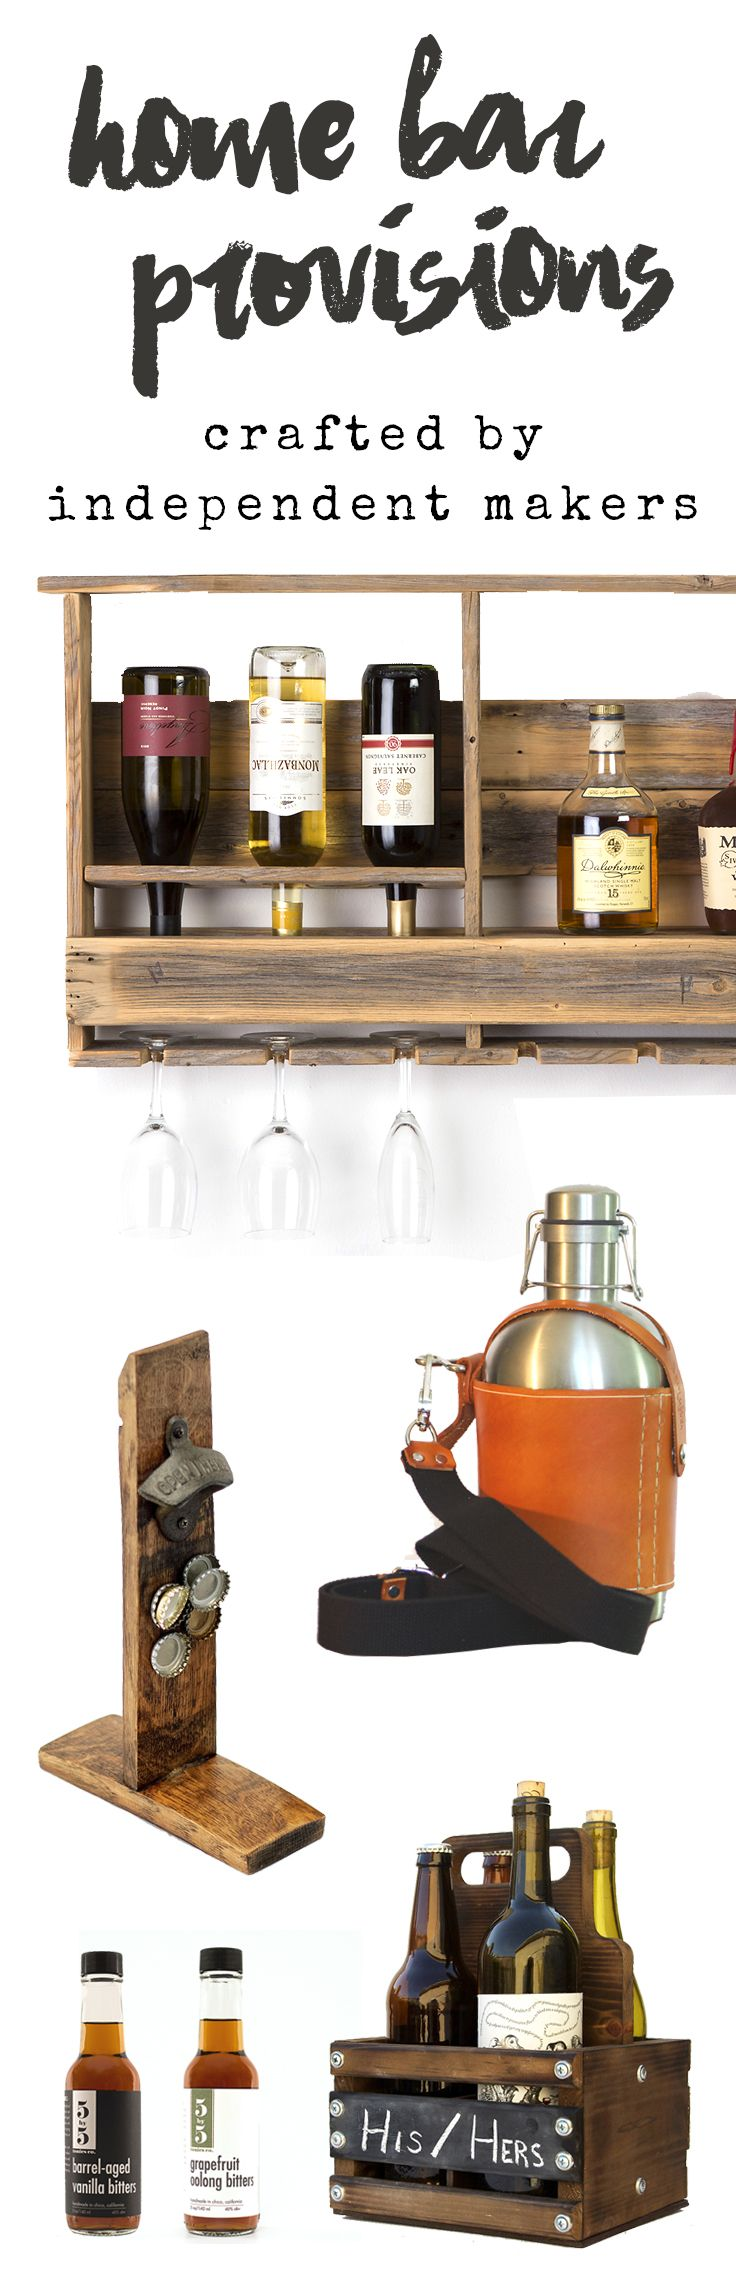 14 Best Budget Kitchen Backsplash Ideas Images On